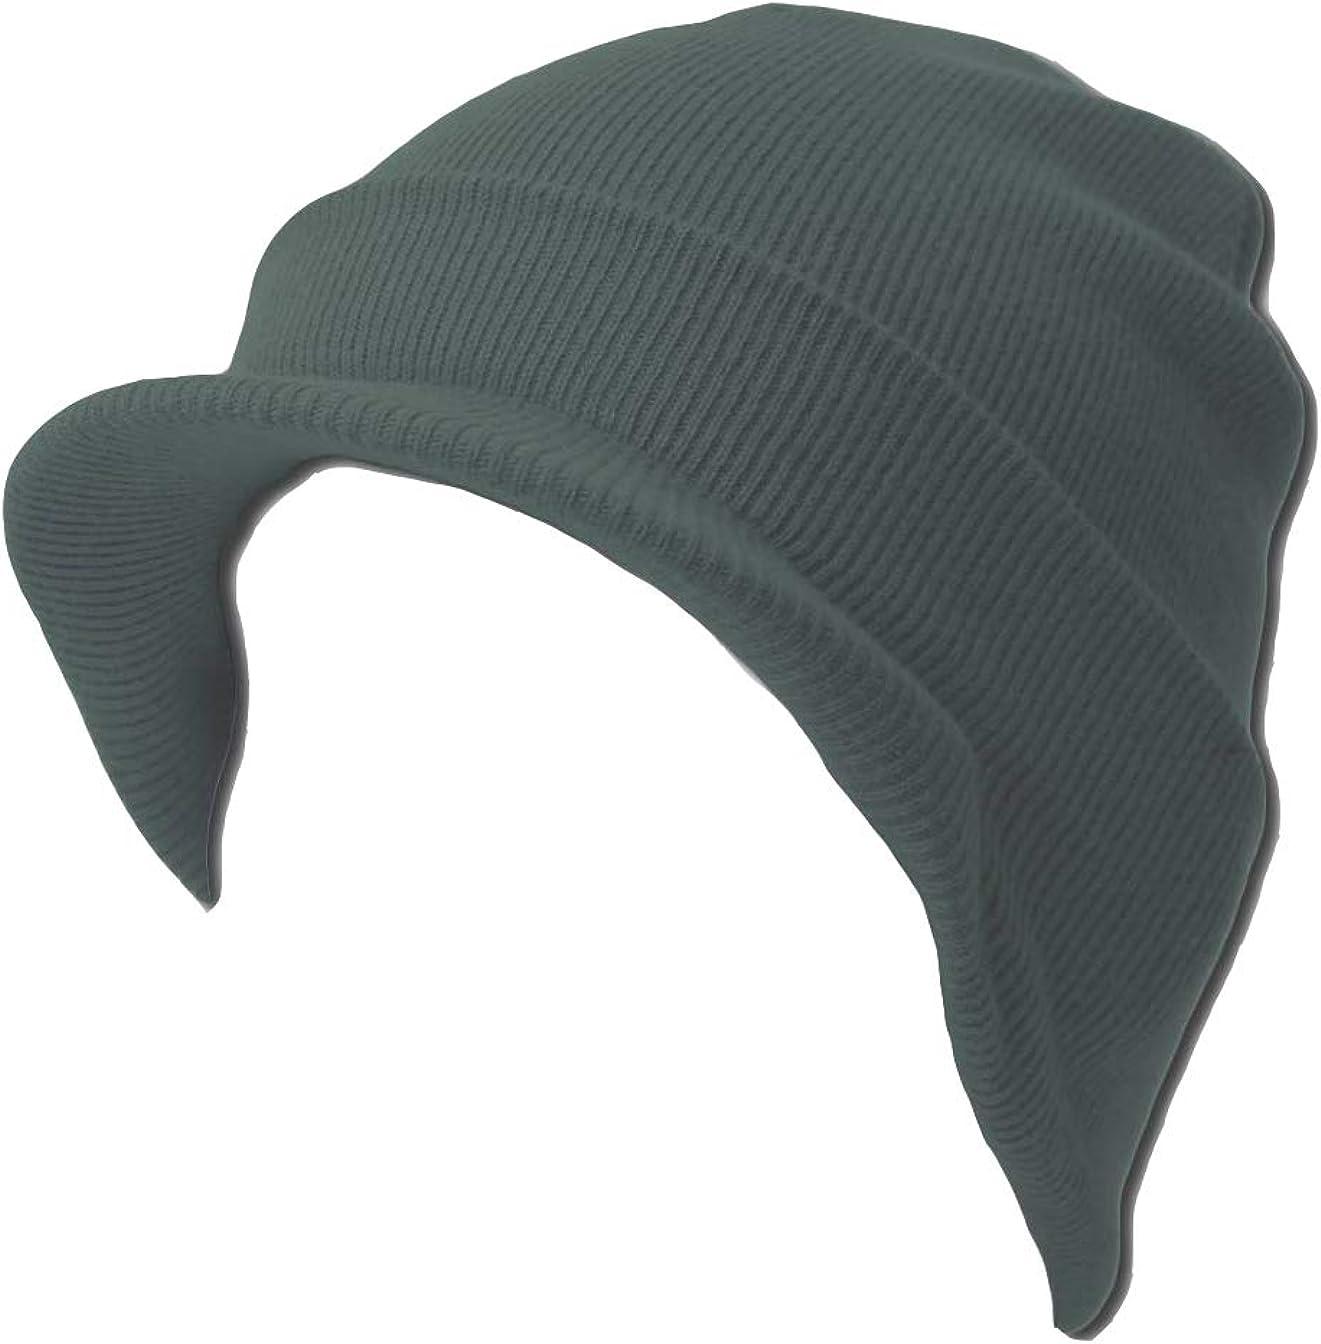 MM Collections Knit Cuff Beanie Visor - Winter Wear/Sports - Heather Grey